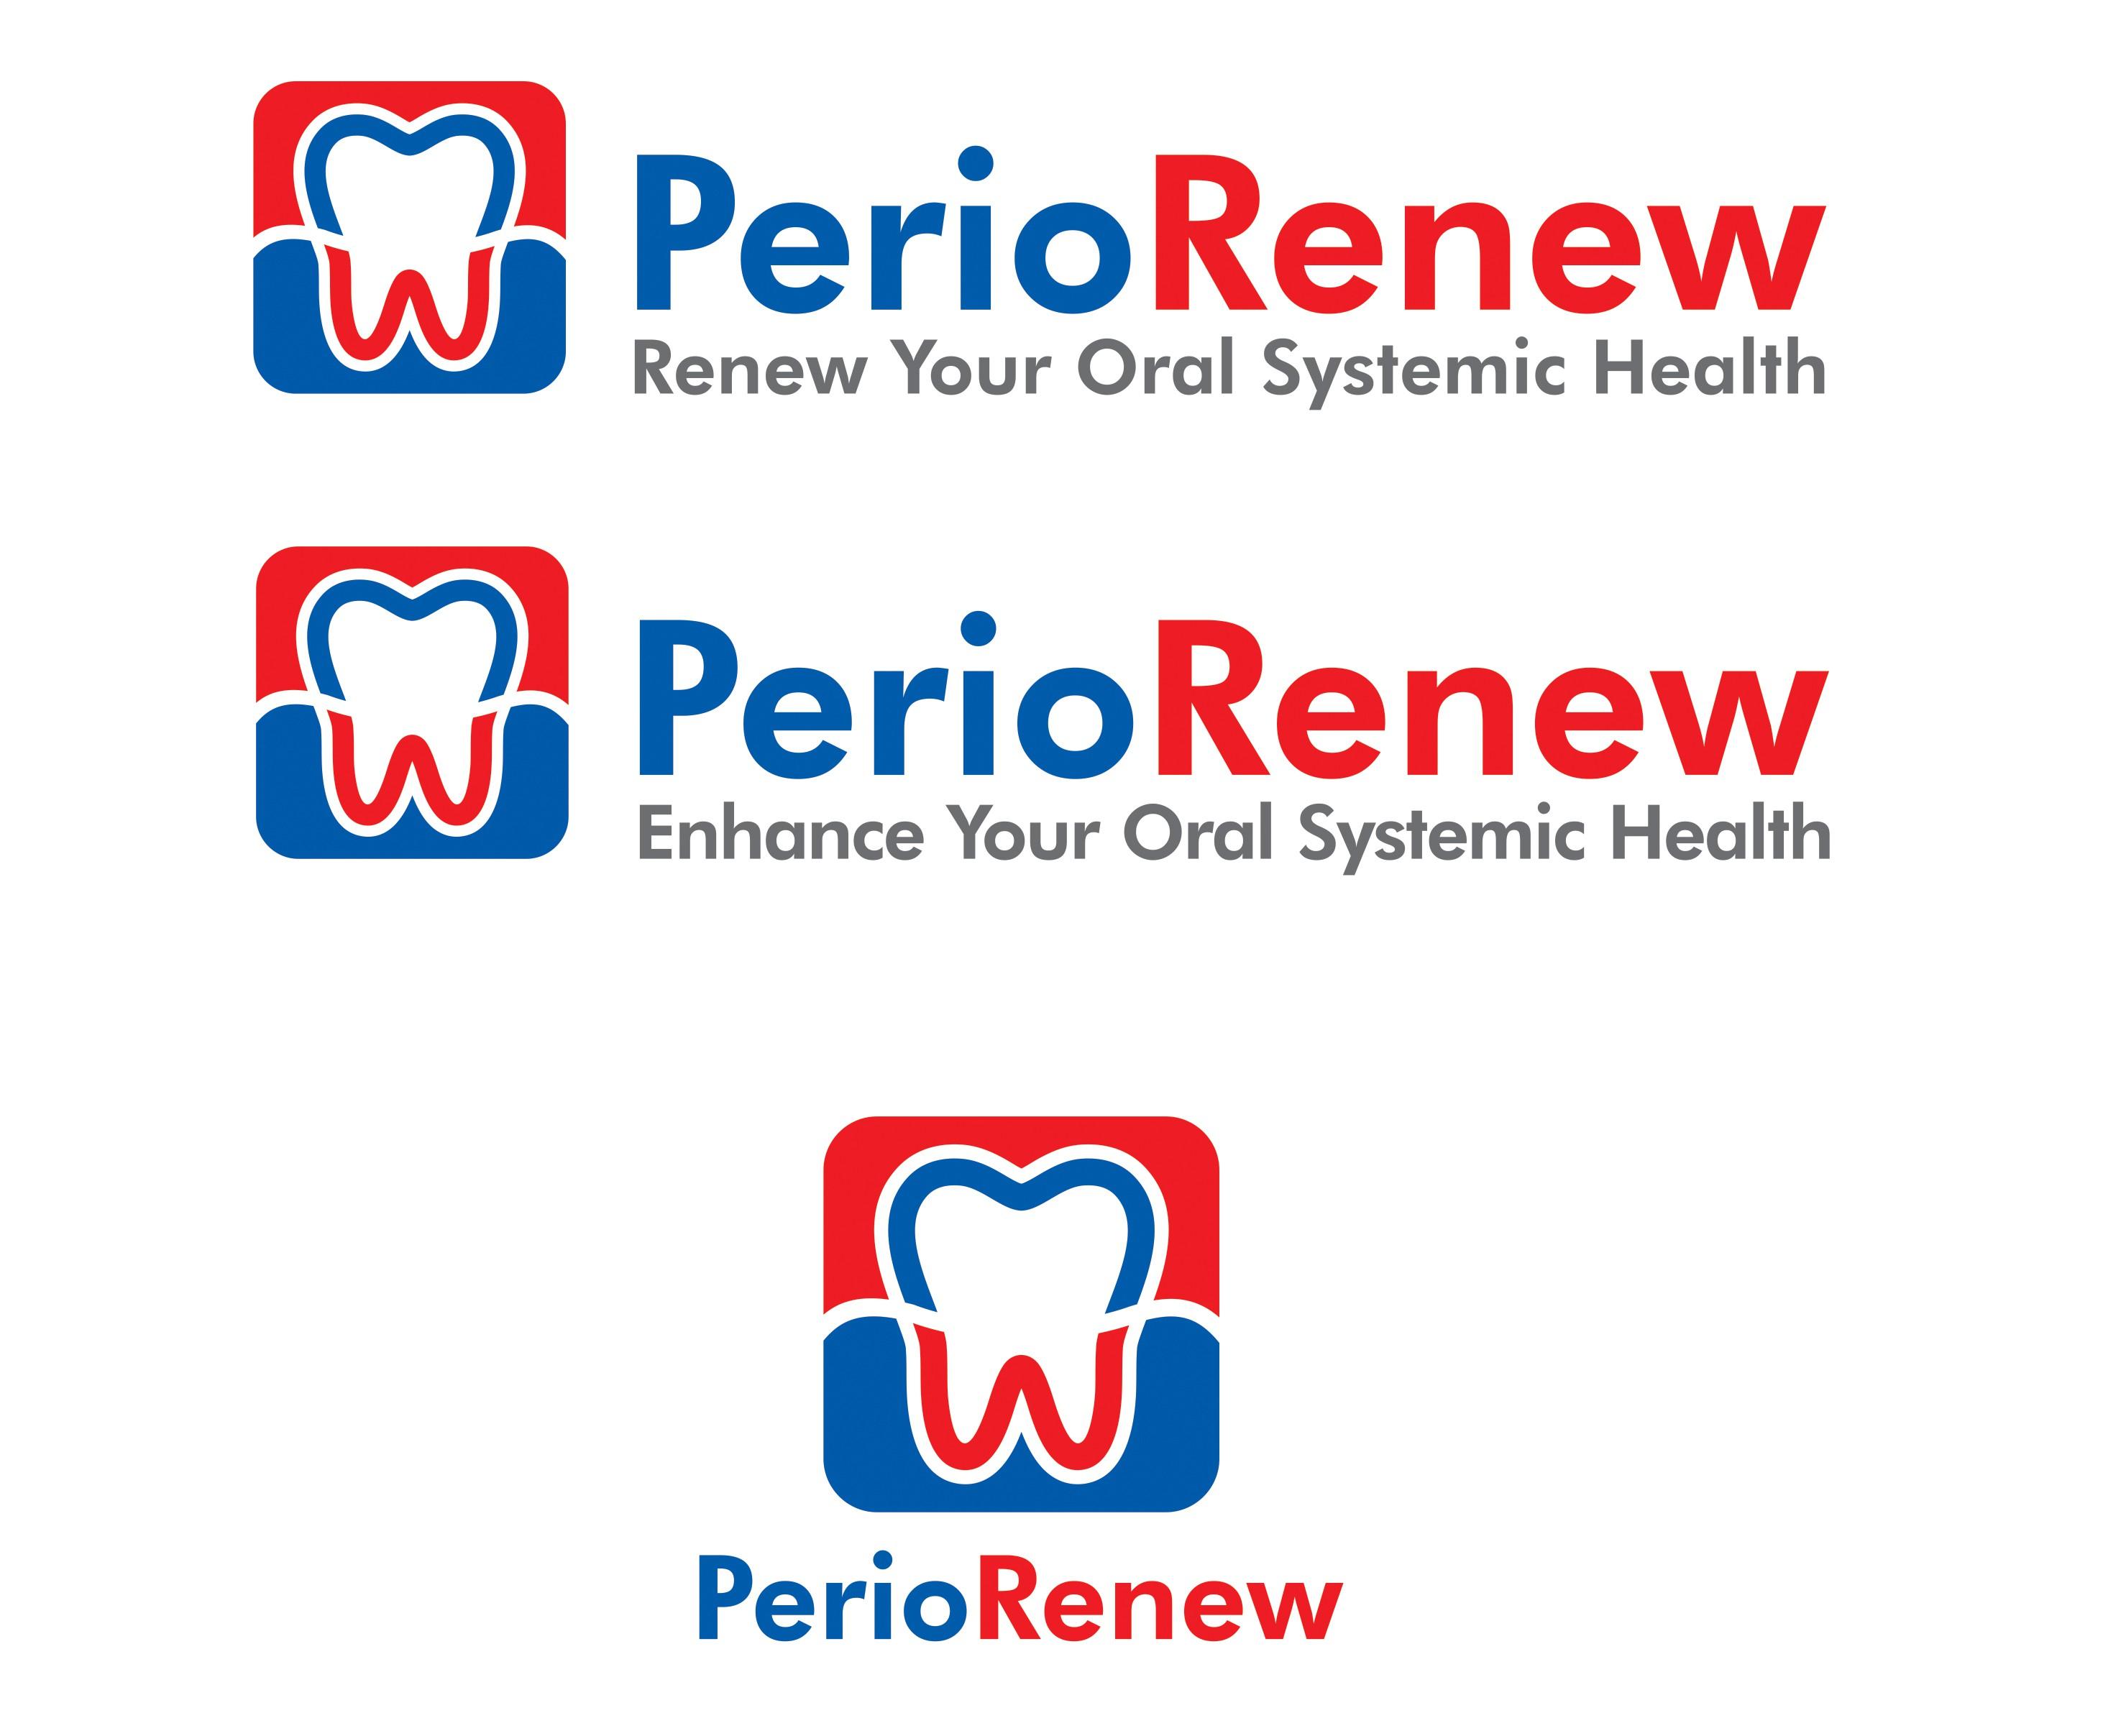 Create logo for perio dental product